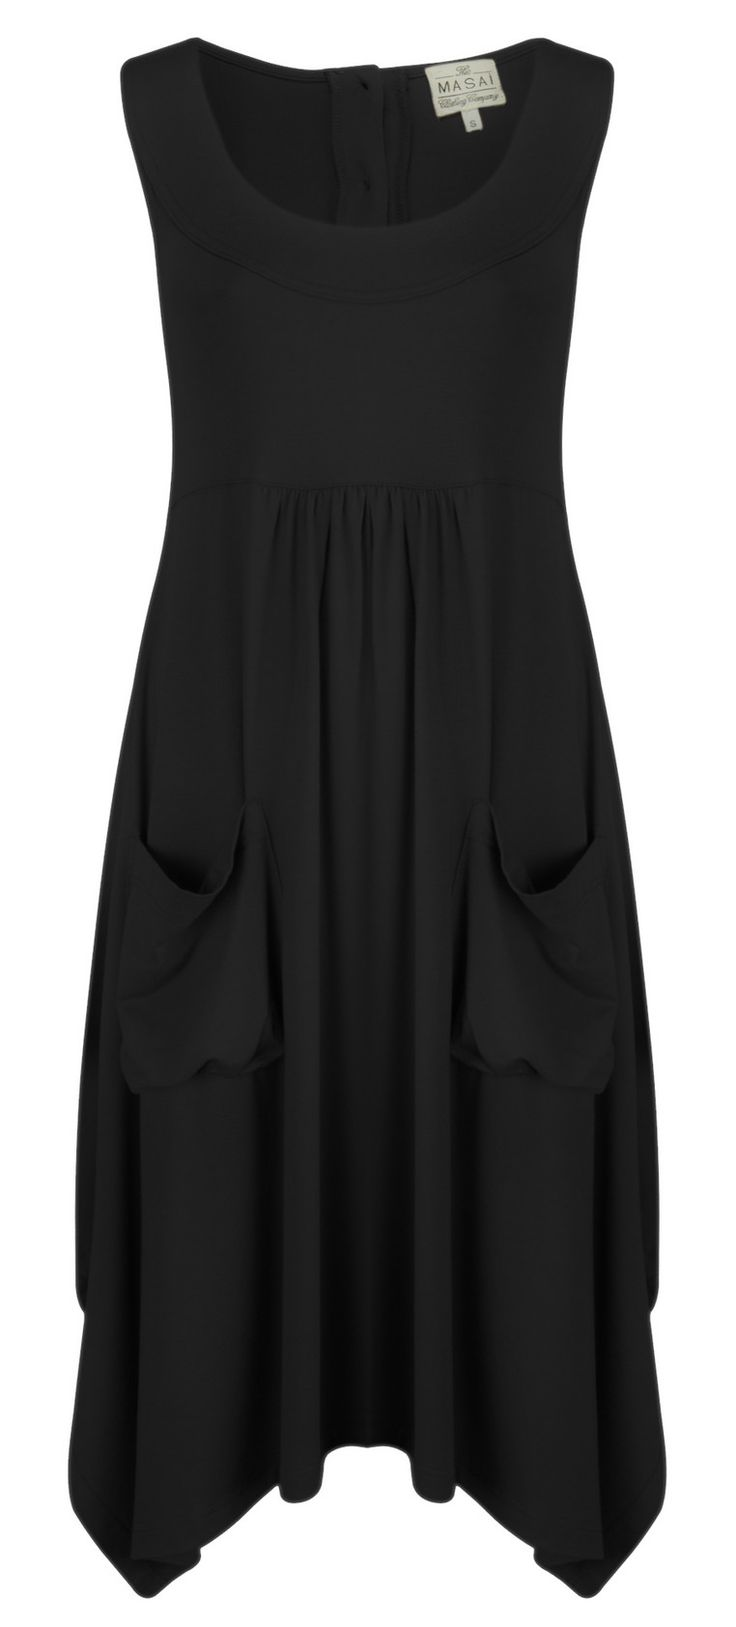 ^Masai Clothing Orinda Wide Bottom Dress (Black) at Gemini Woman